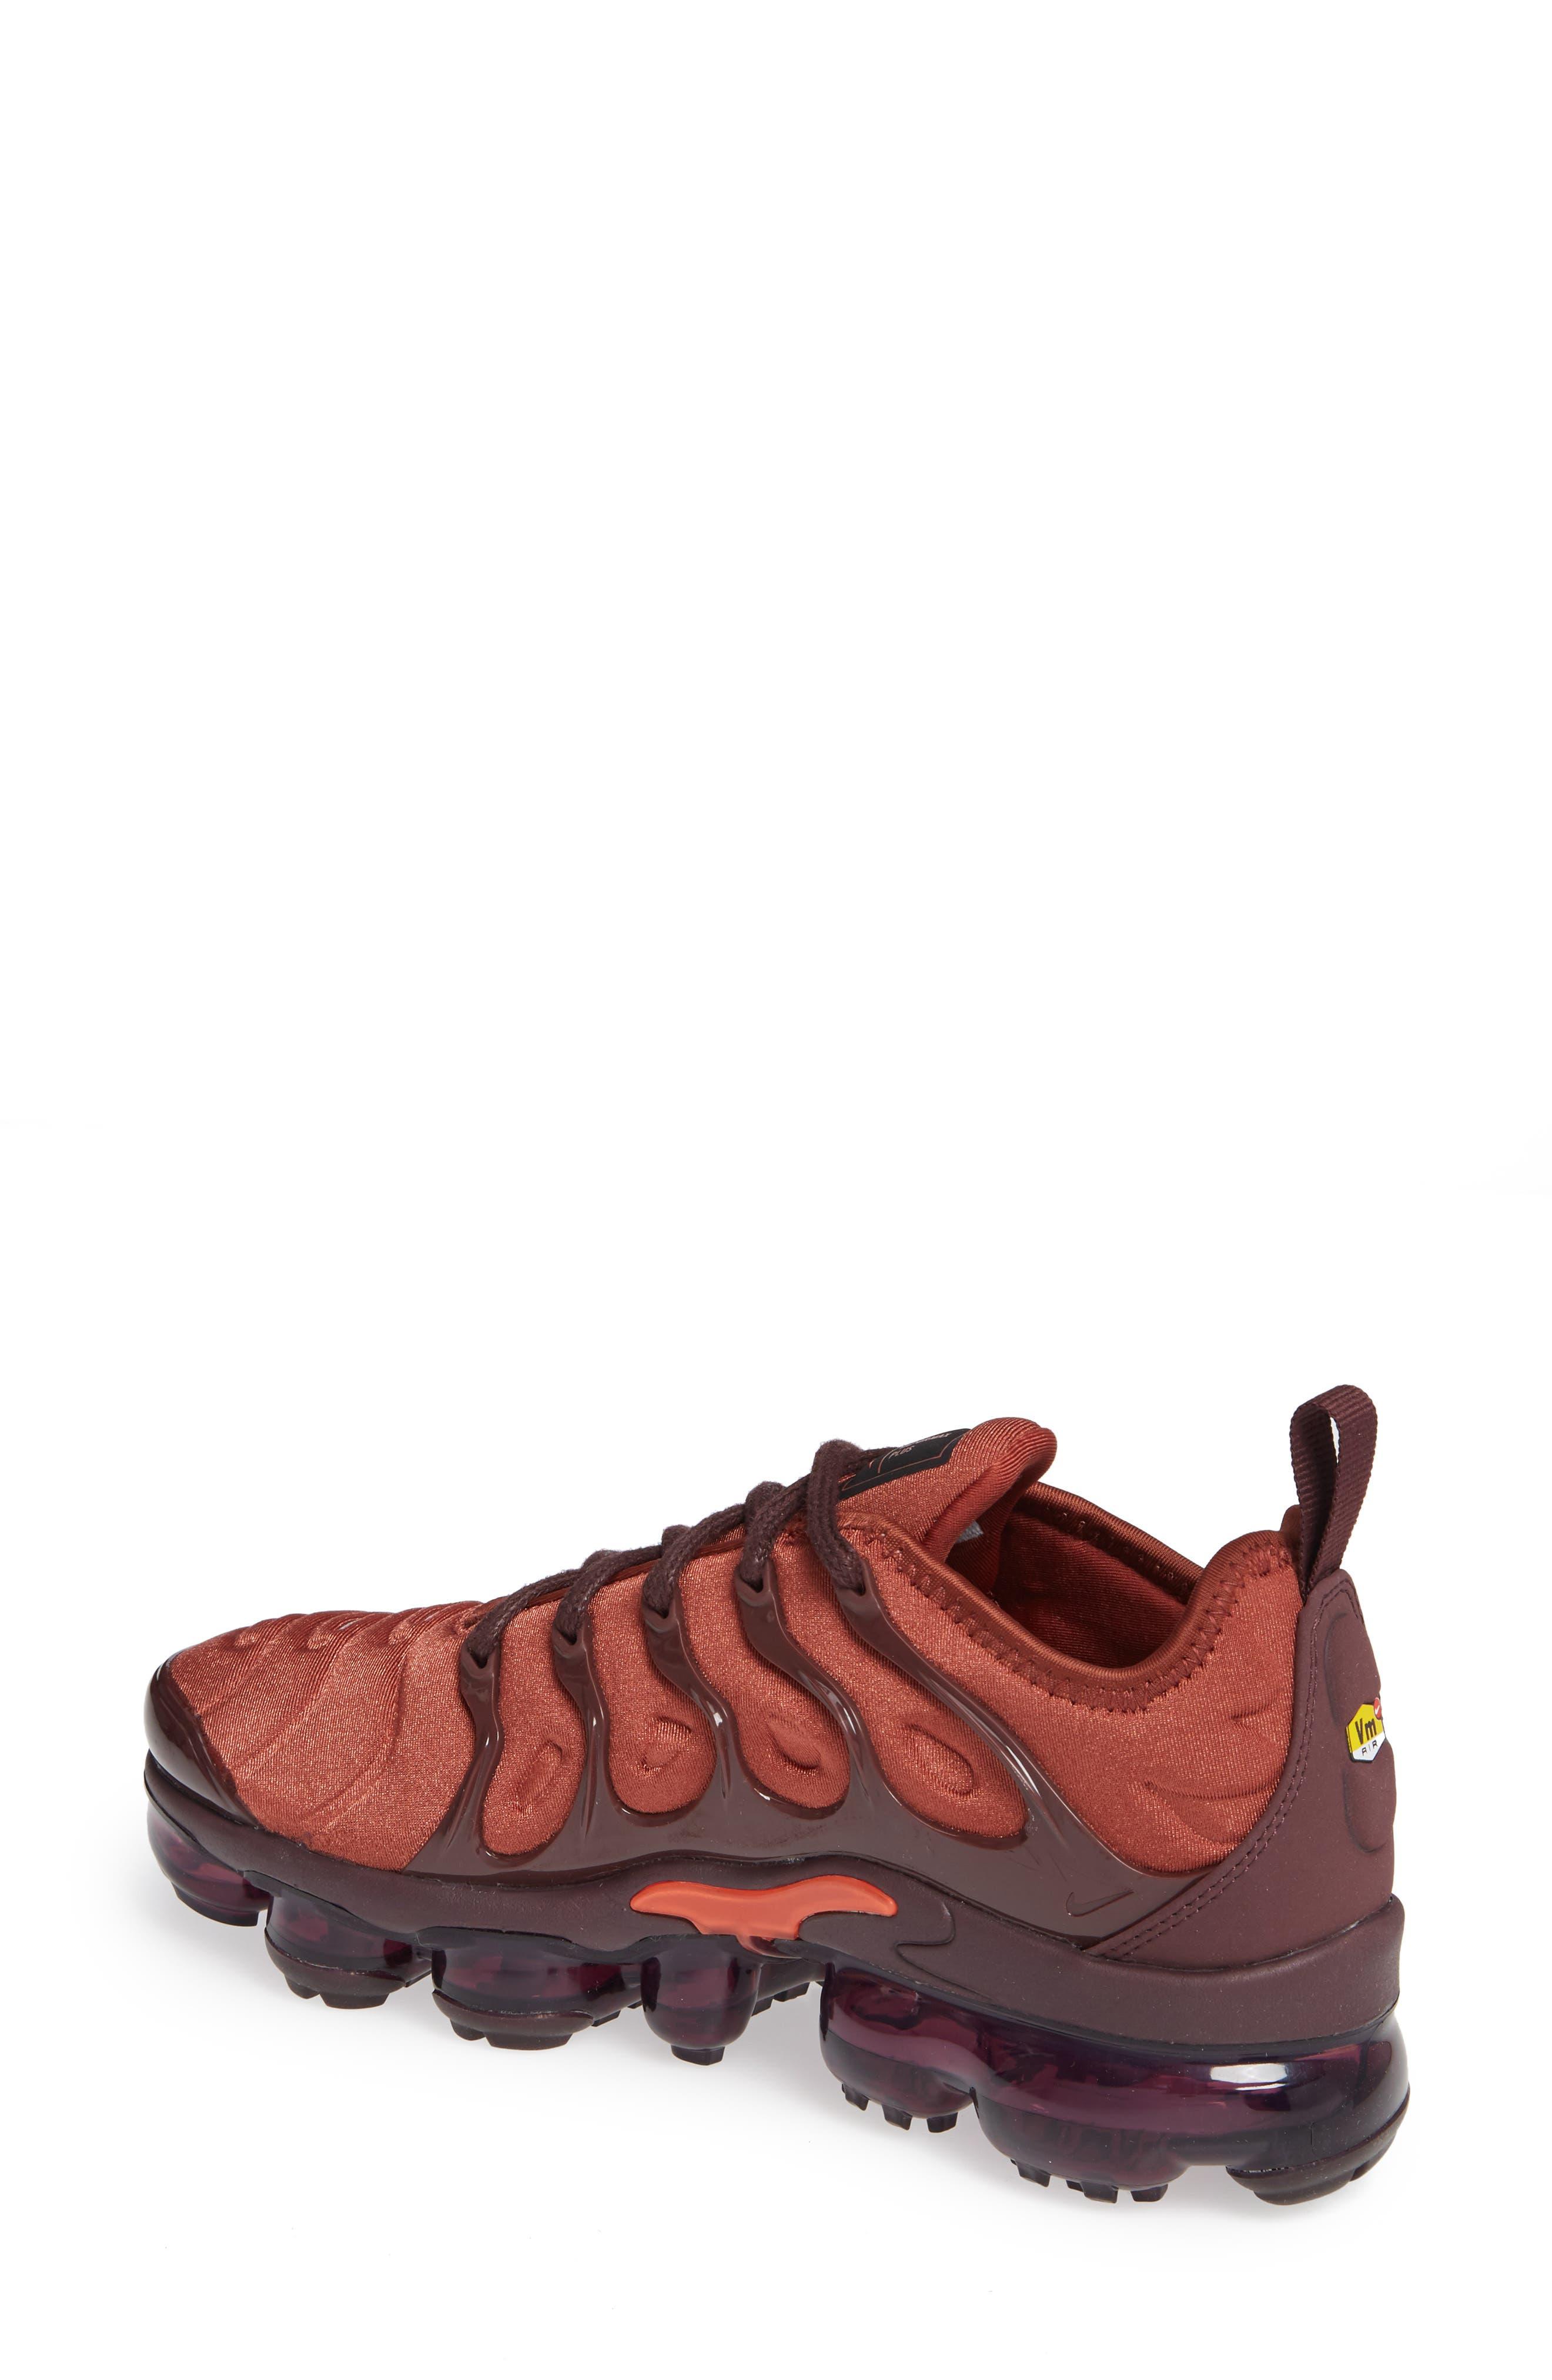 Air VaporMax Plus Sneaker,                             Alternate thumbnail 2, color,                             BURNT ORANGE/ RED-BURGUNDY